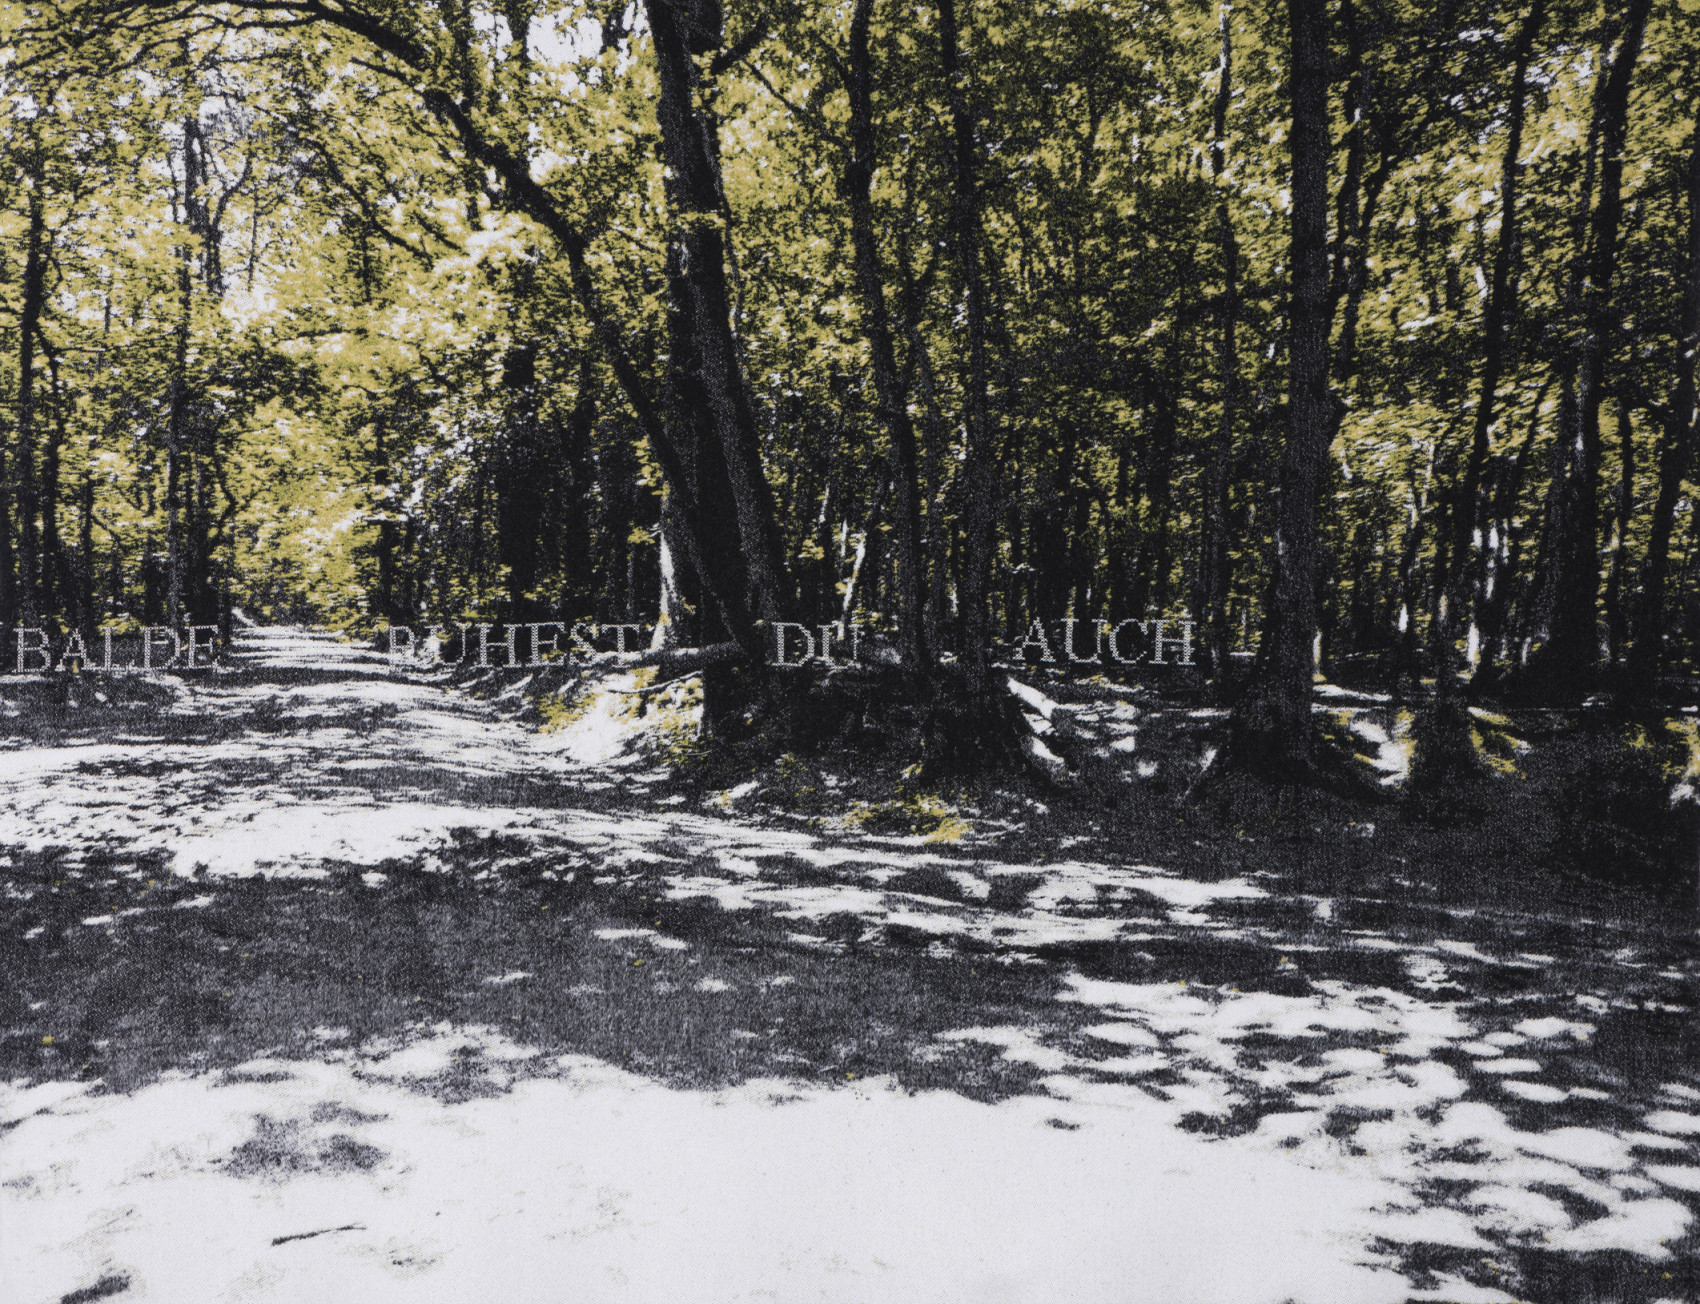 'Balde Ruhest du Auch' - (verse Goethe) Grosser Ettersberg, Weimar- Jacquard woven - double weaves - mohair -text embroideredby hand - 160 x 235 cm - 2012 -(photograph: Peter Cox)